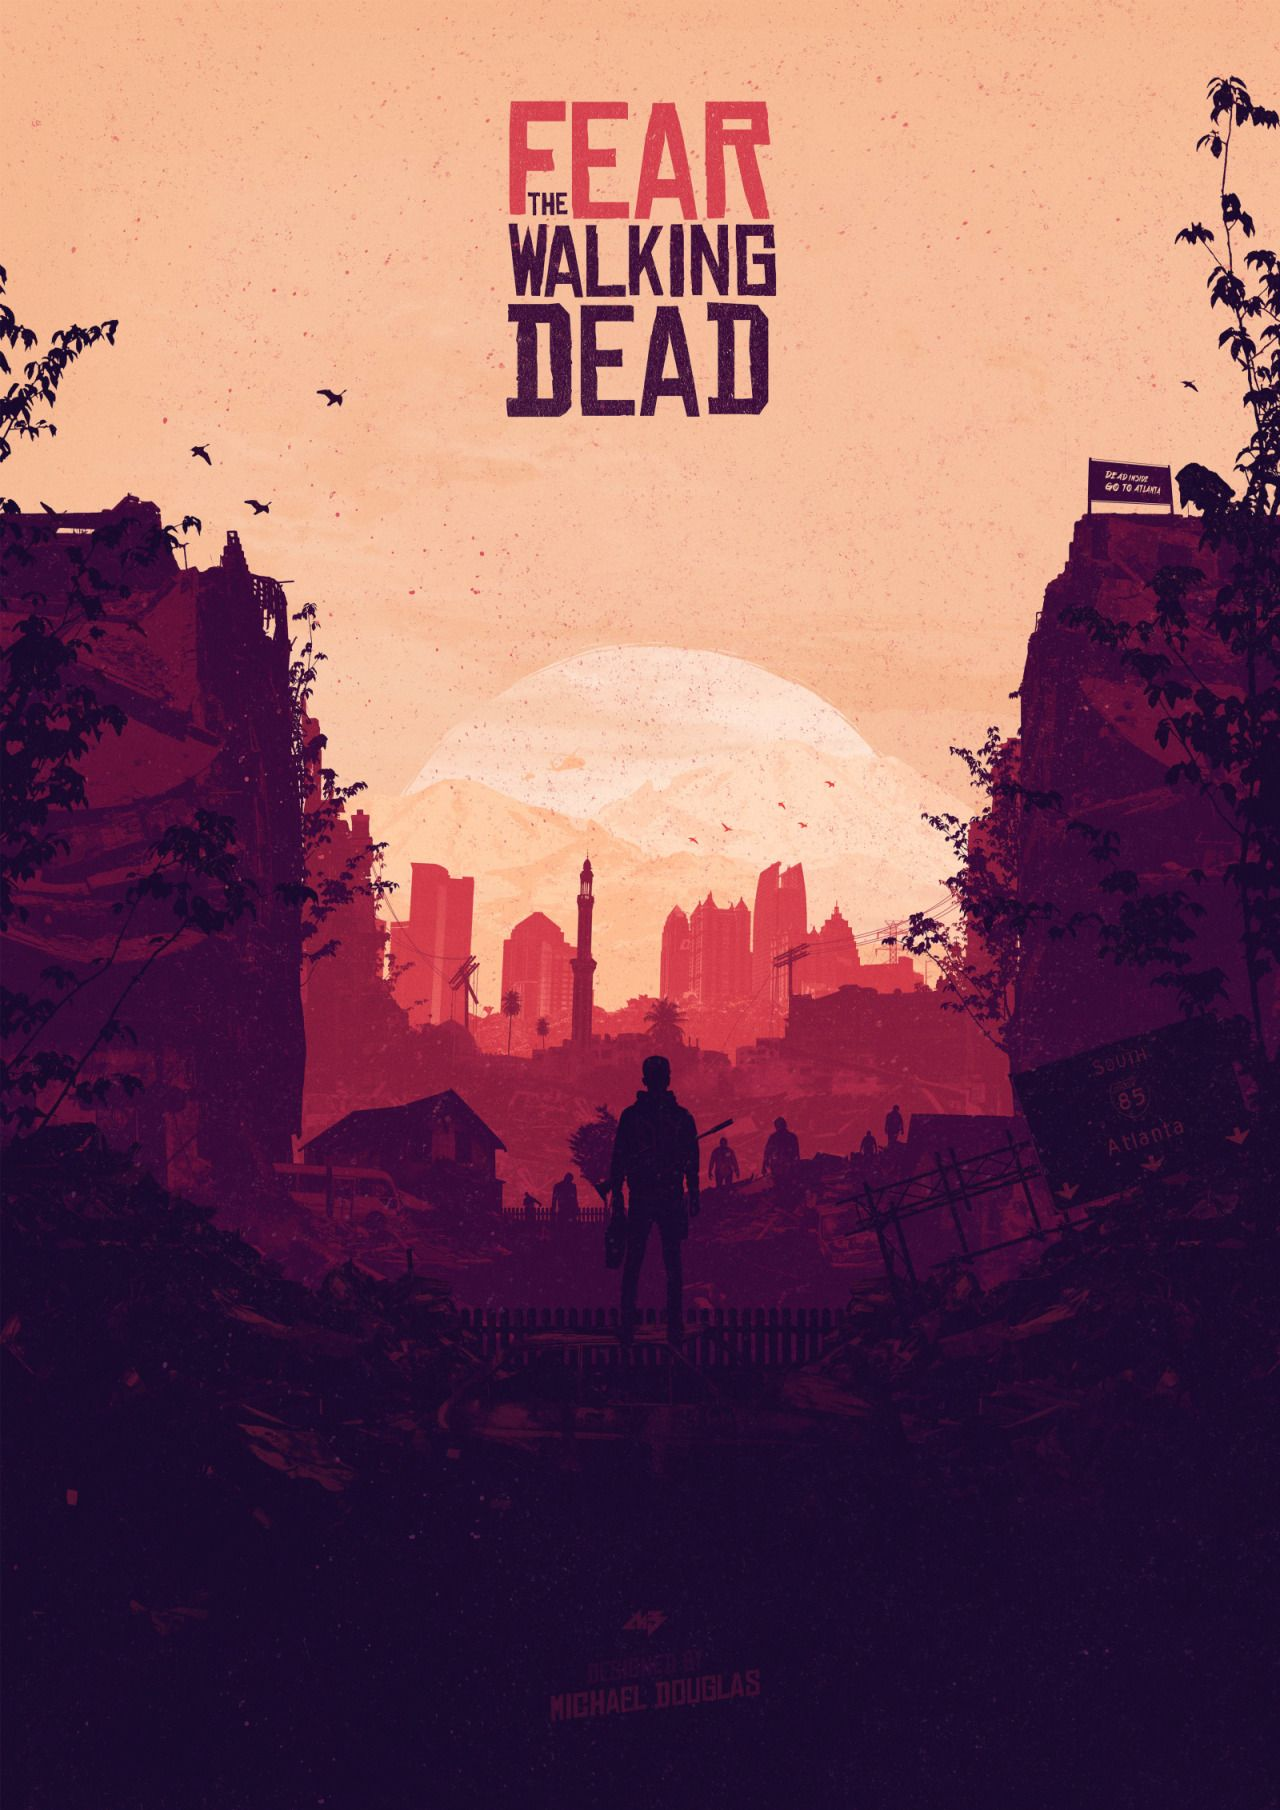 Fear The Walking Dead Poster Created By Michael Douglas